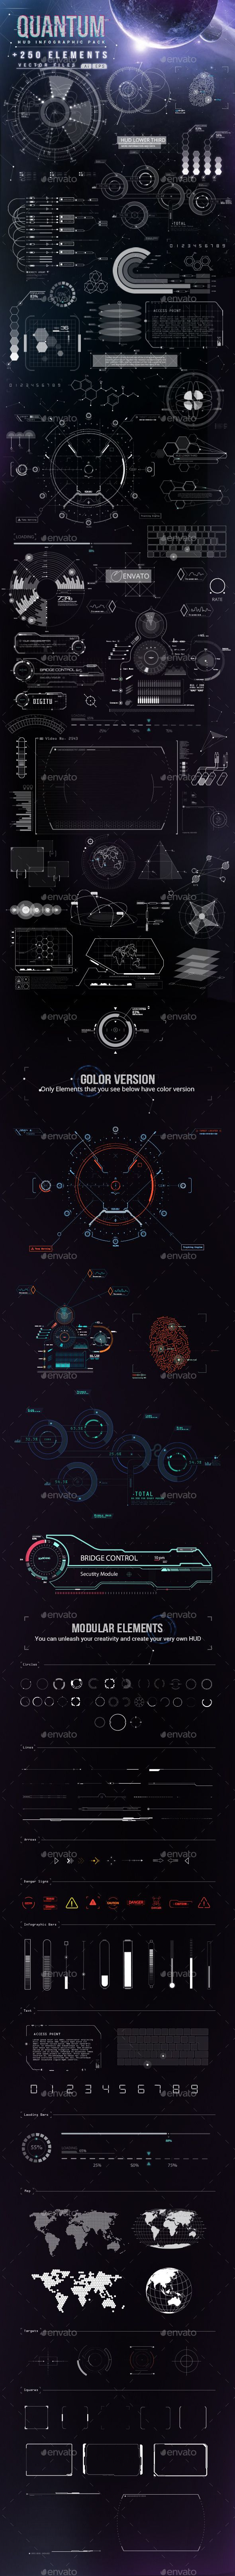 Quantum - HiTech HUD Creator Kit Template #design Download: http://graphicriver.net/item/quantum-hitech-hud-creator-kit/9020363?ref=ksioks